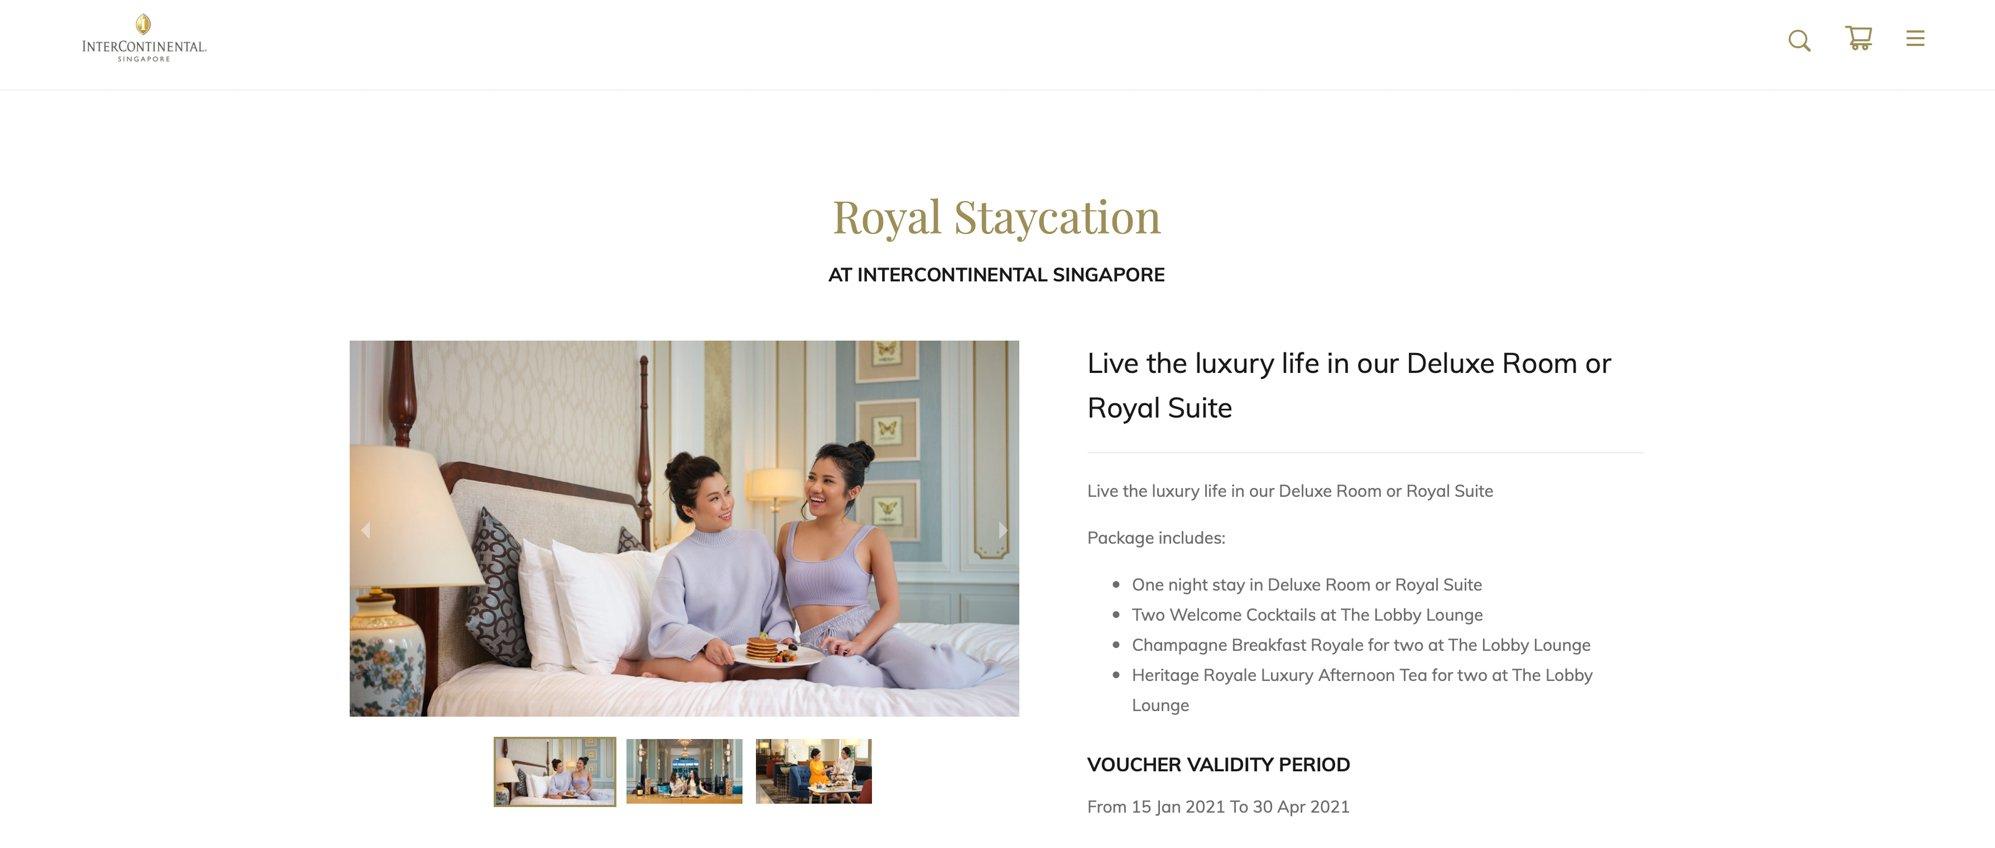 InterContinental Hotel Singapore Media Feature Hospitality Photography Jose Jeuland-29